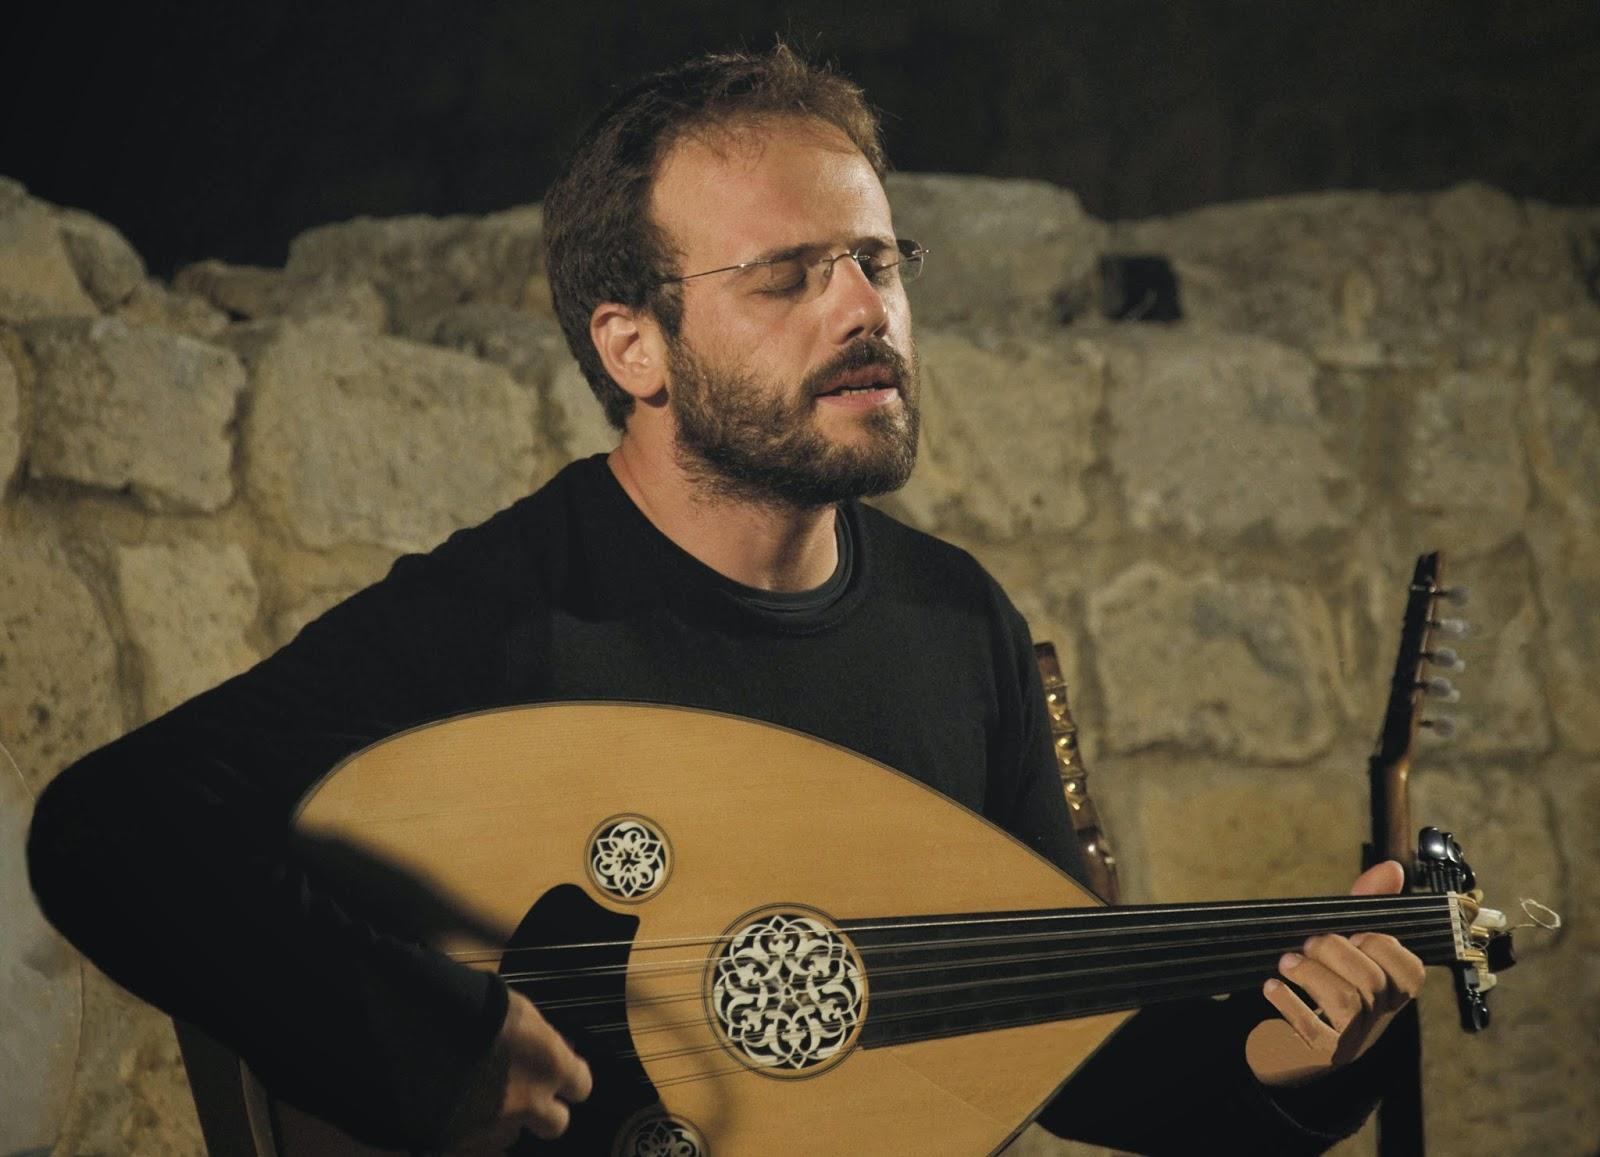 giorgos-mavromanolakis-aliko-3-6-2014